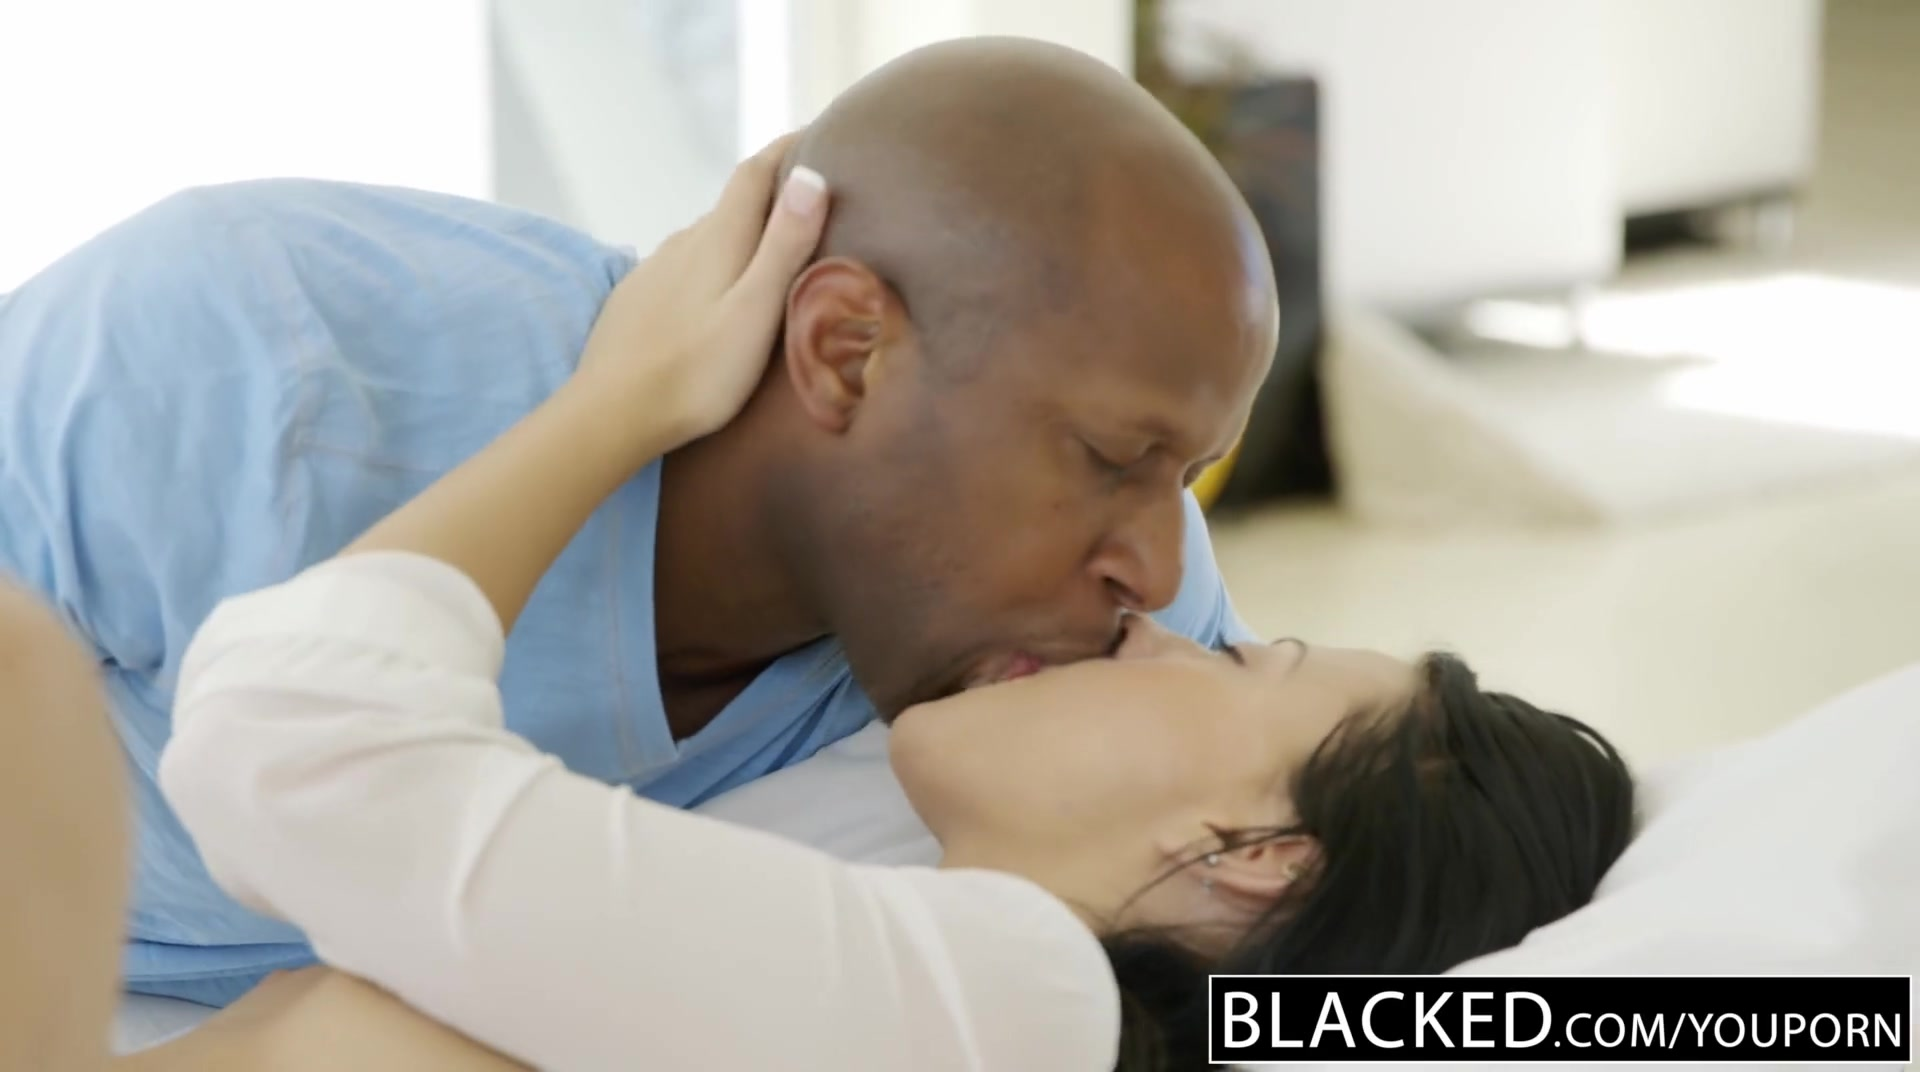 Free HD BLACKED Teen beauty tries Interracial anal sex Porn Video